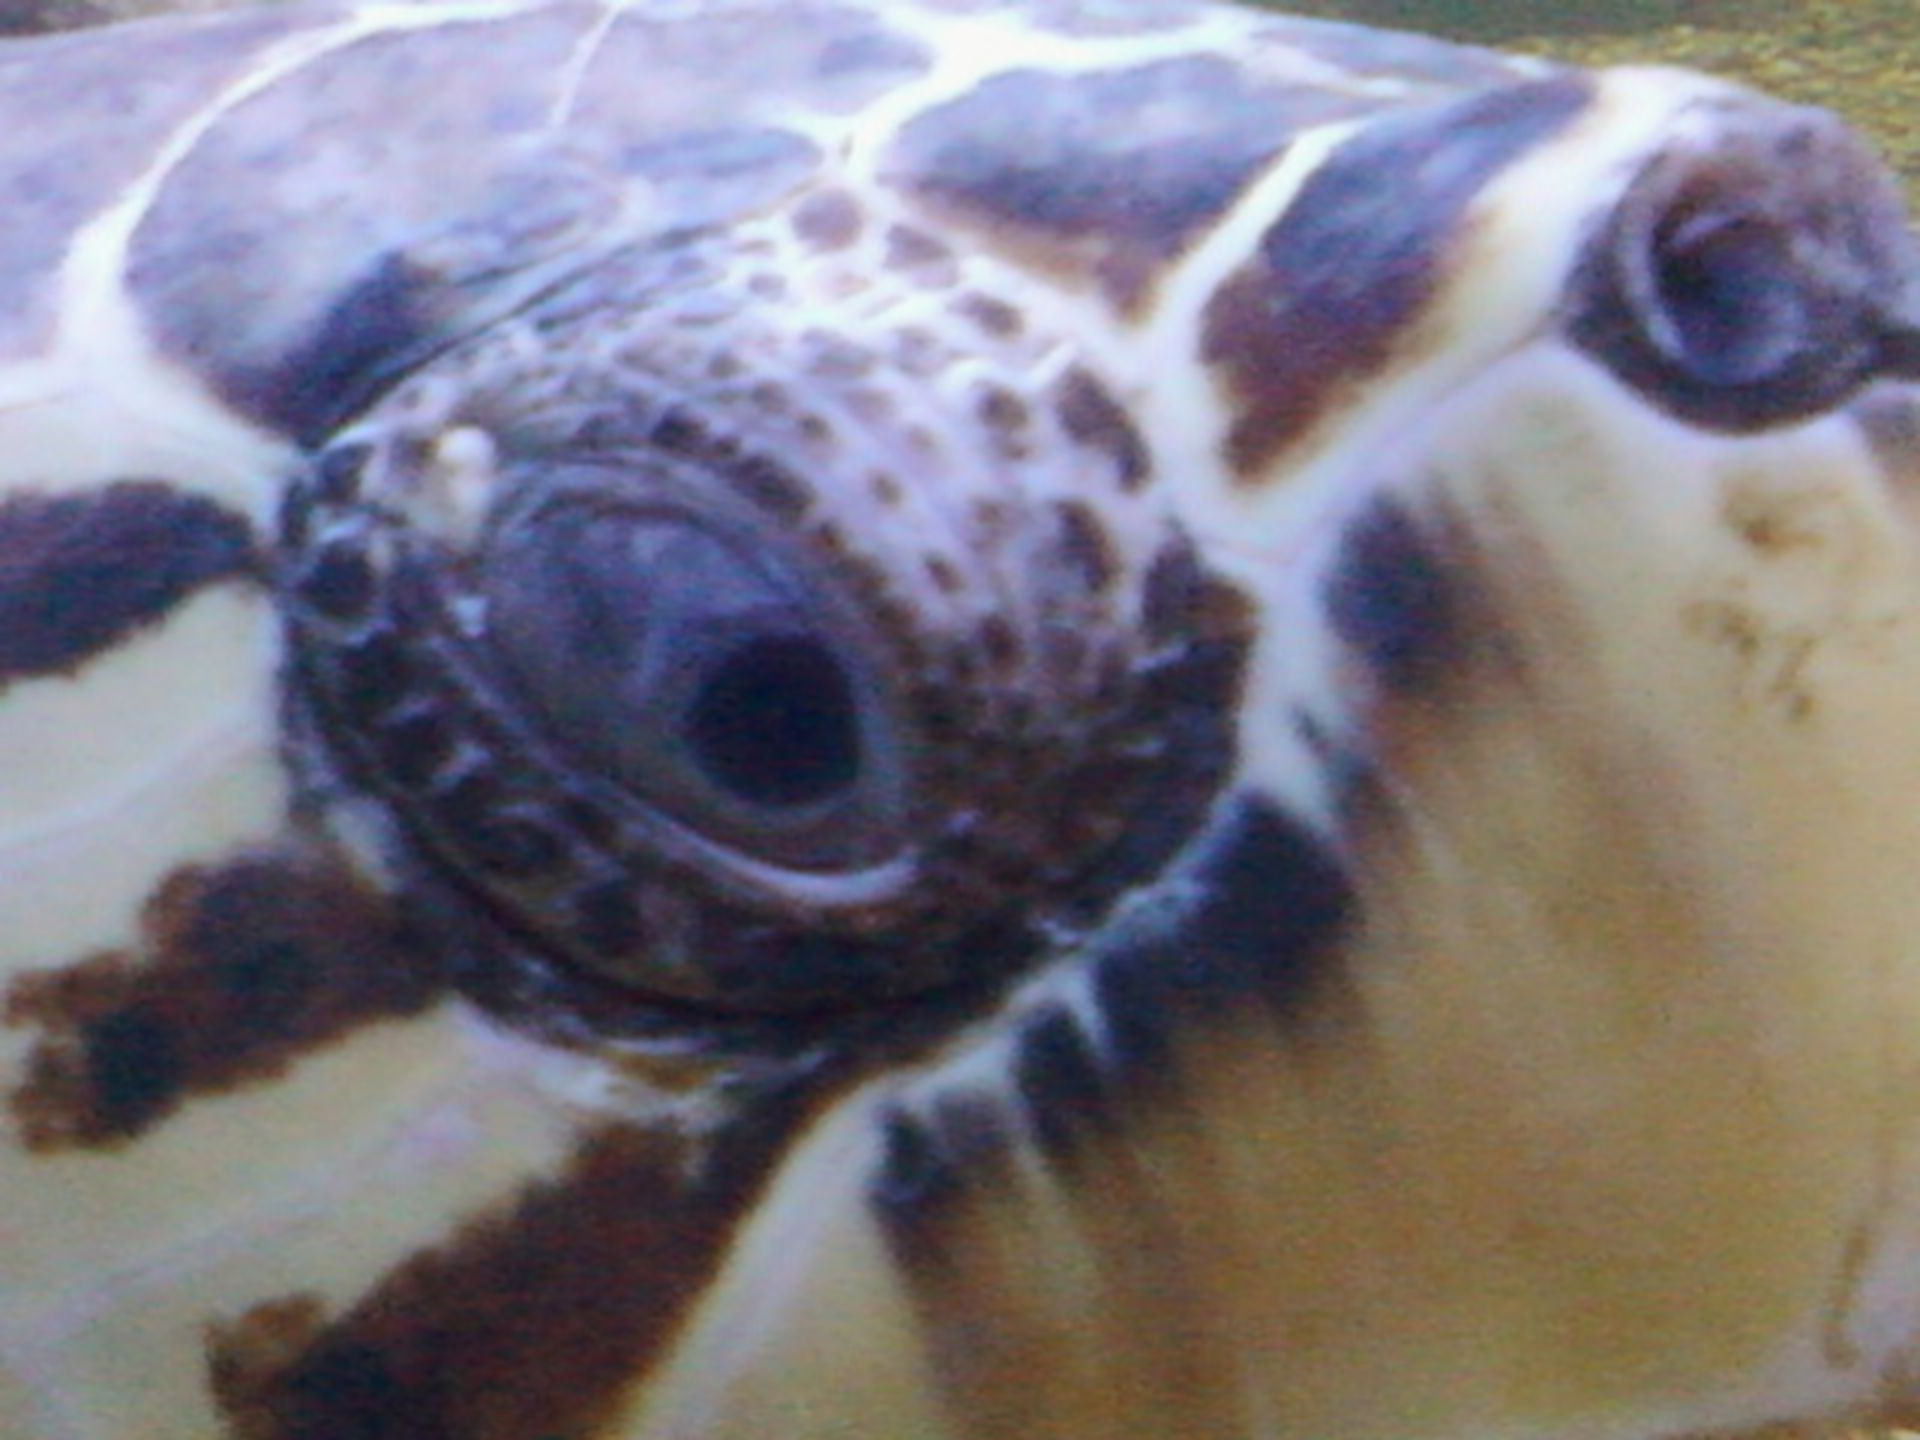 Konjunktiva-Verletzung Karettschildkröte